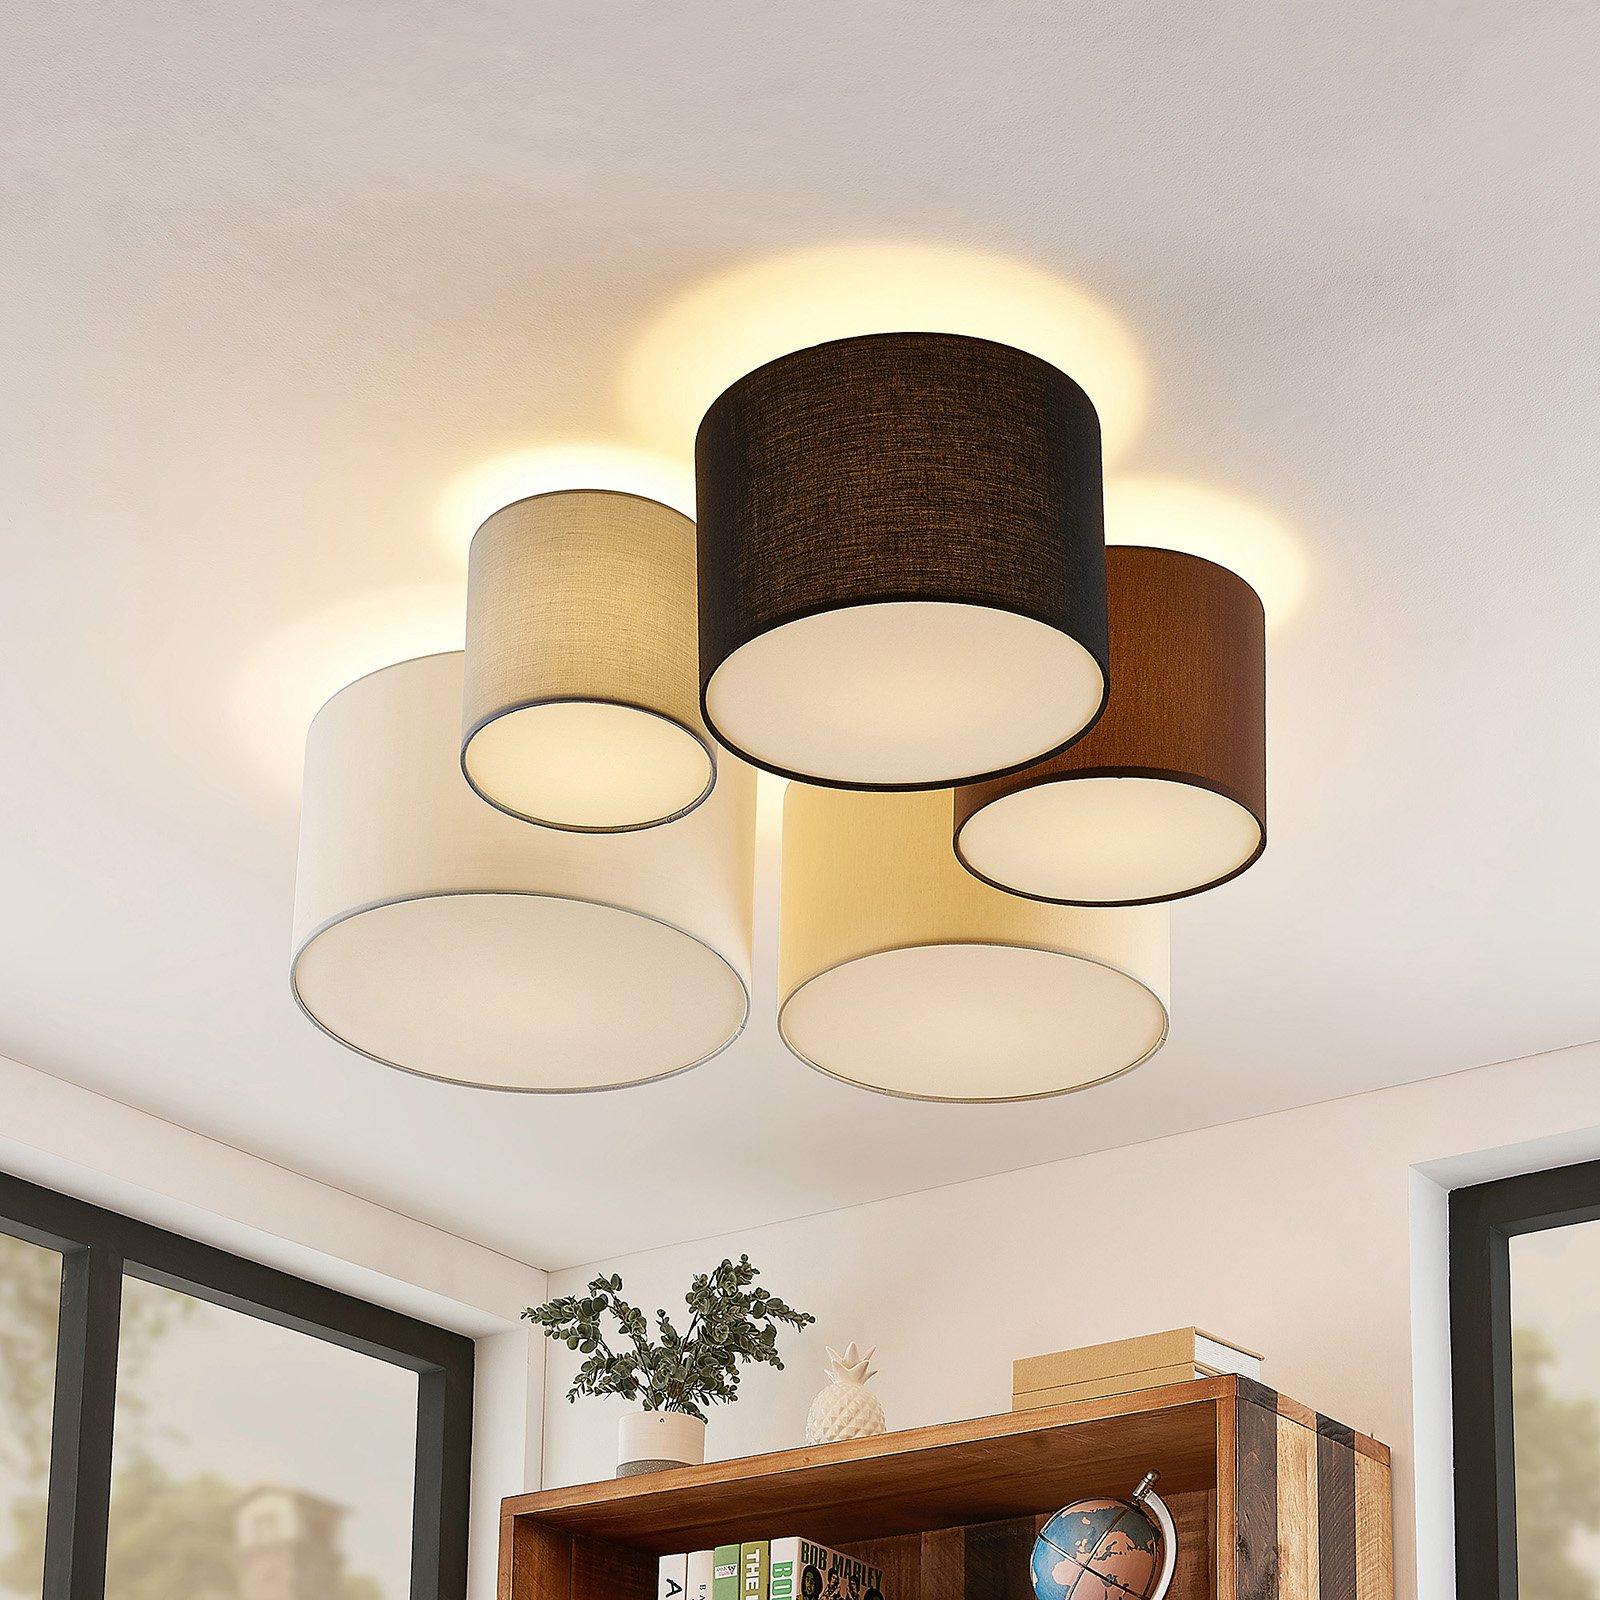 Lindby Laurenz taklampe, 5 lys 90cm brun-beige